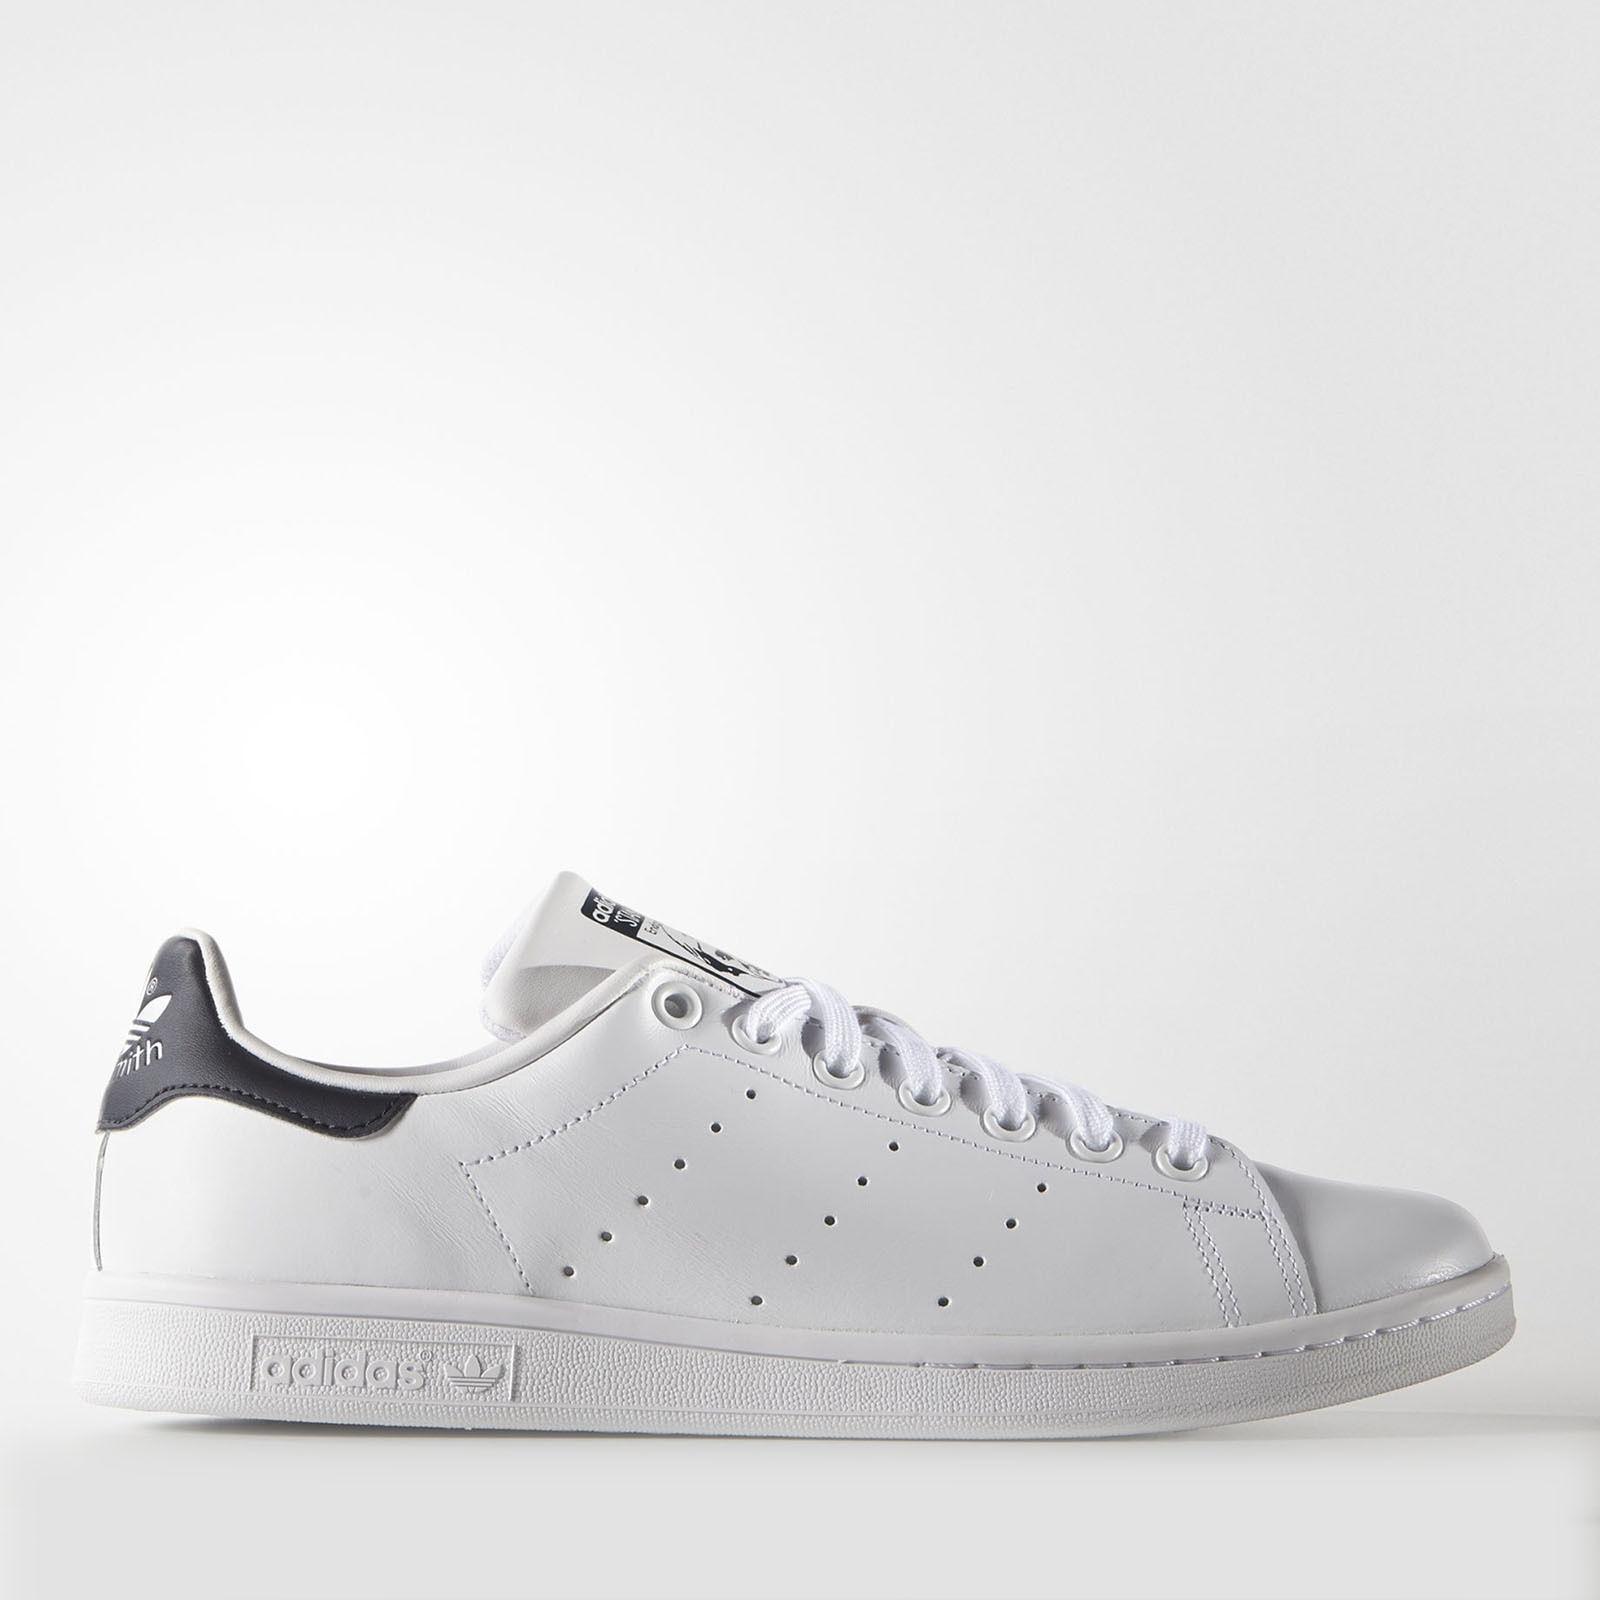 New Adidas Men's Originals Stan Smith shoes (M20325)  White    White-New Navy